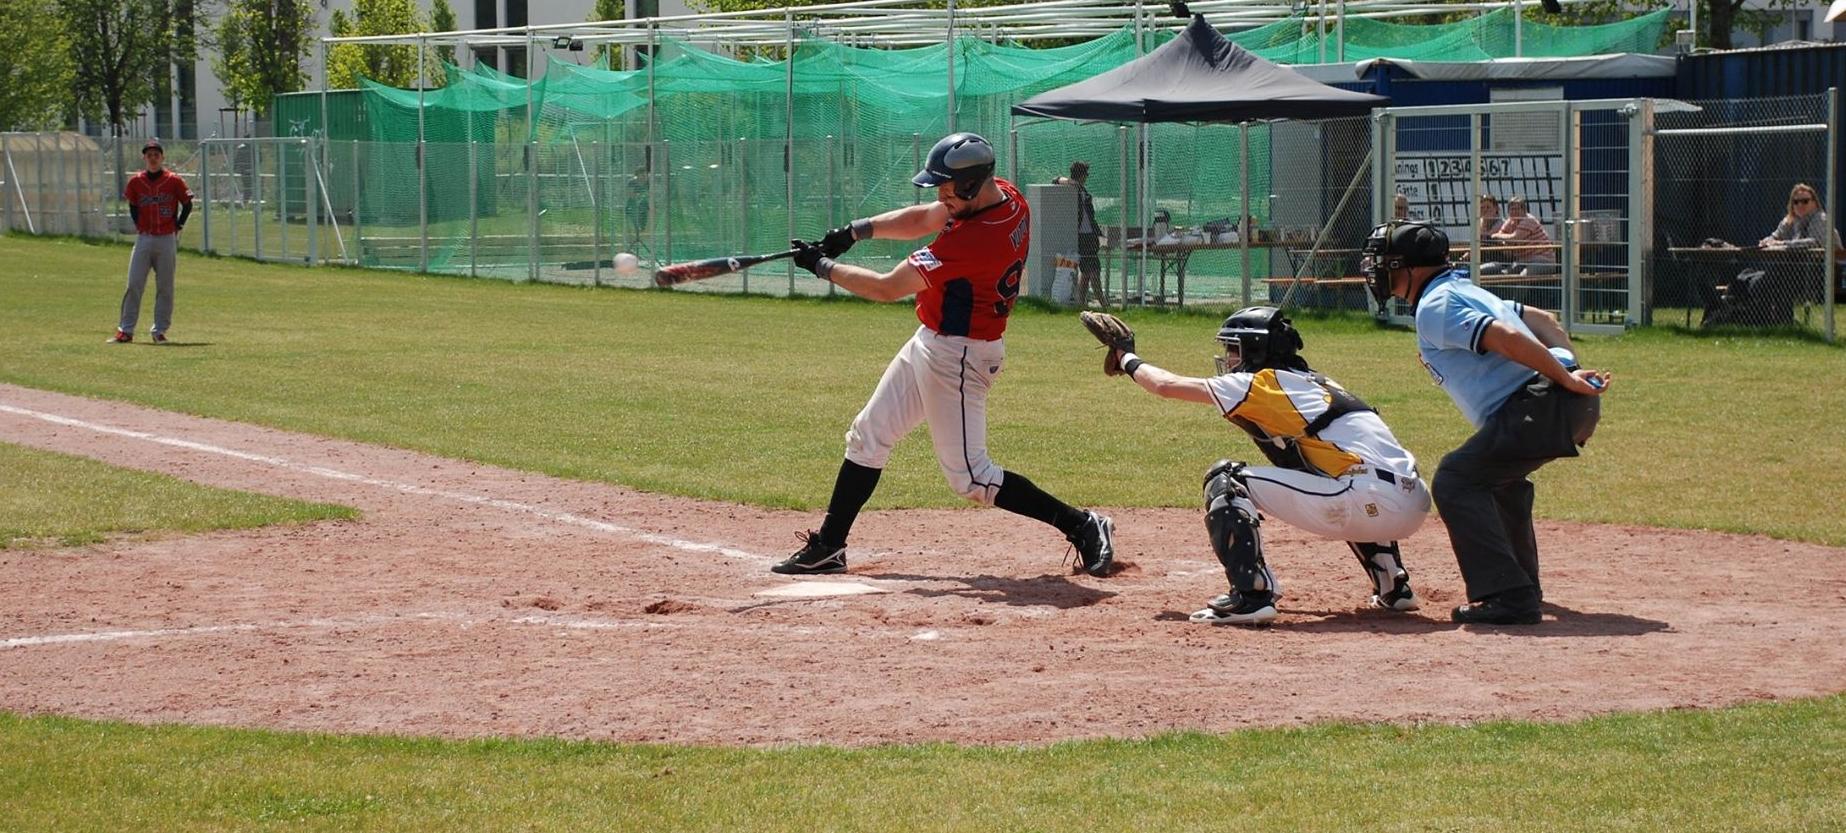 Baseballverein Garching Atomics e.V. (1)